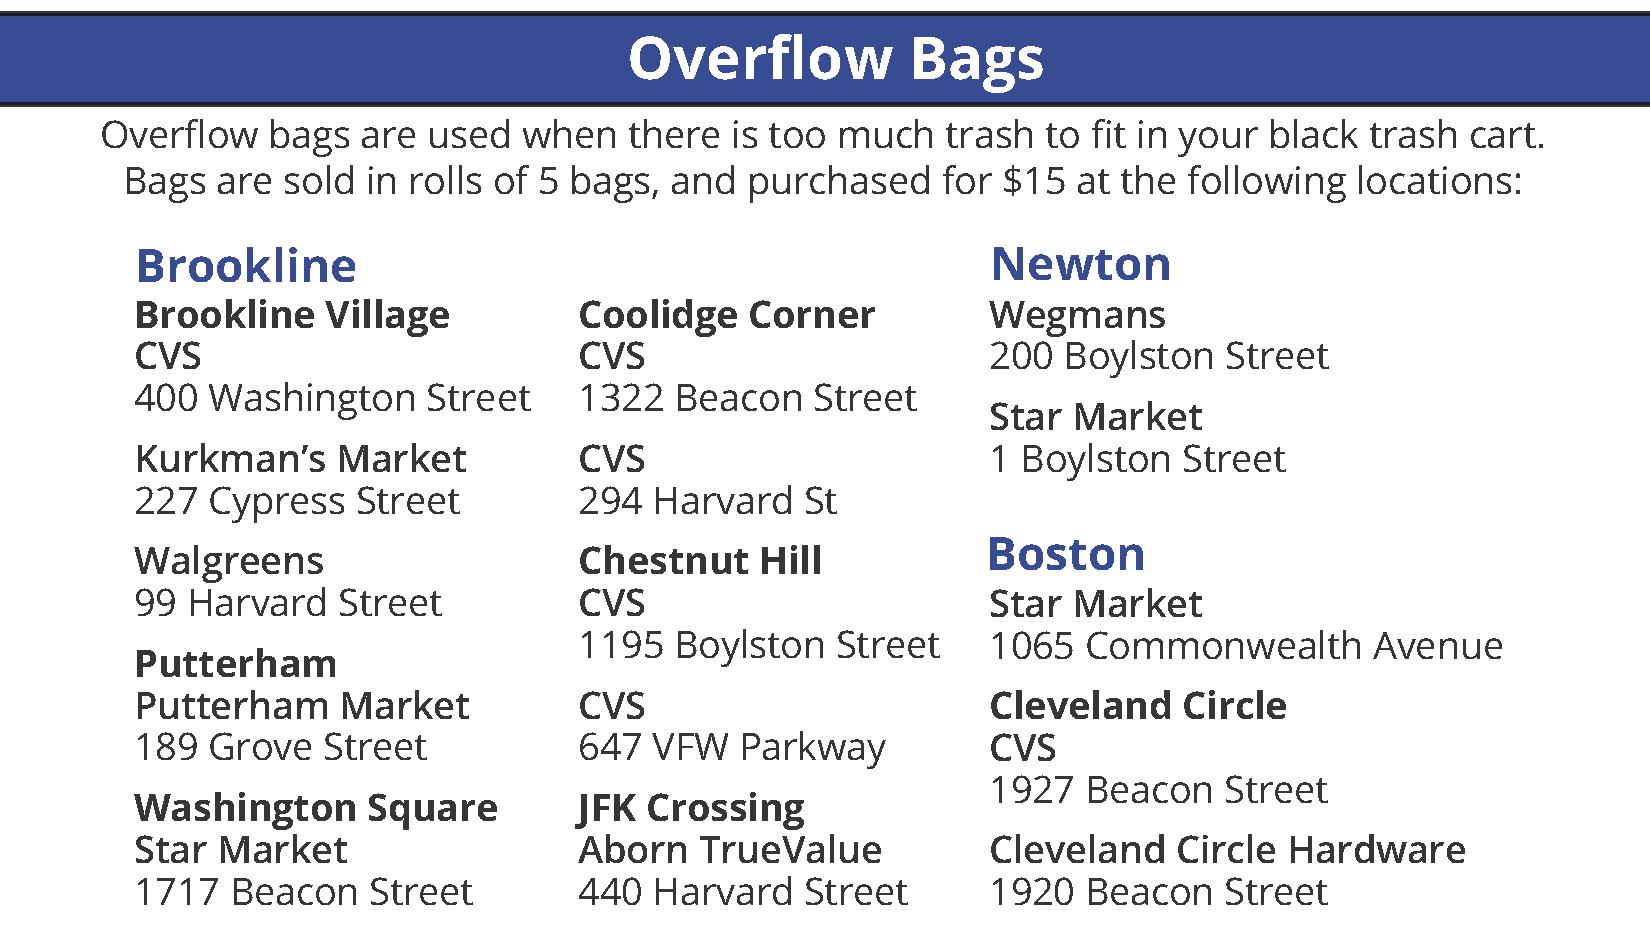 Overflow Trash Bags | Brookline, MA - Official Website